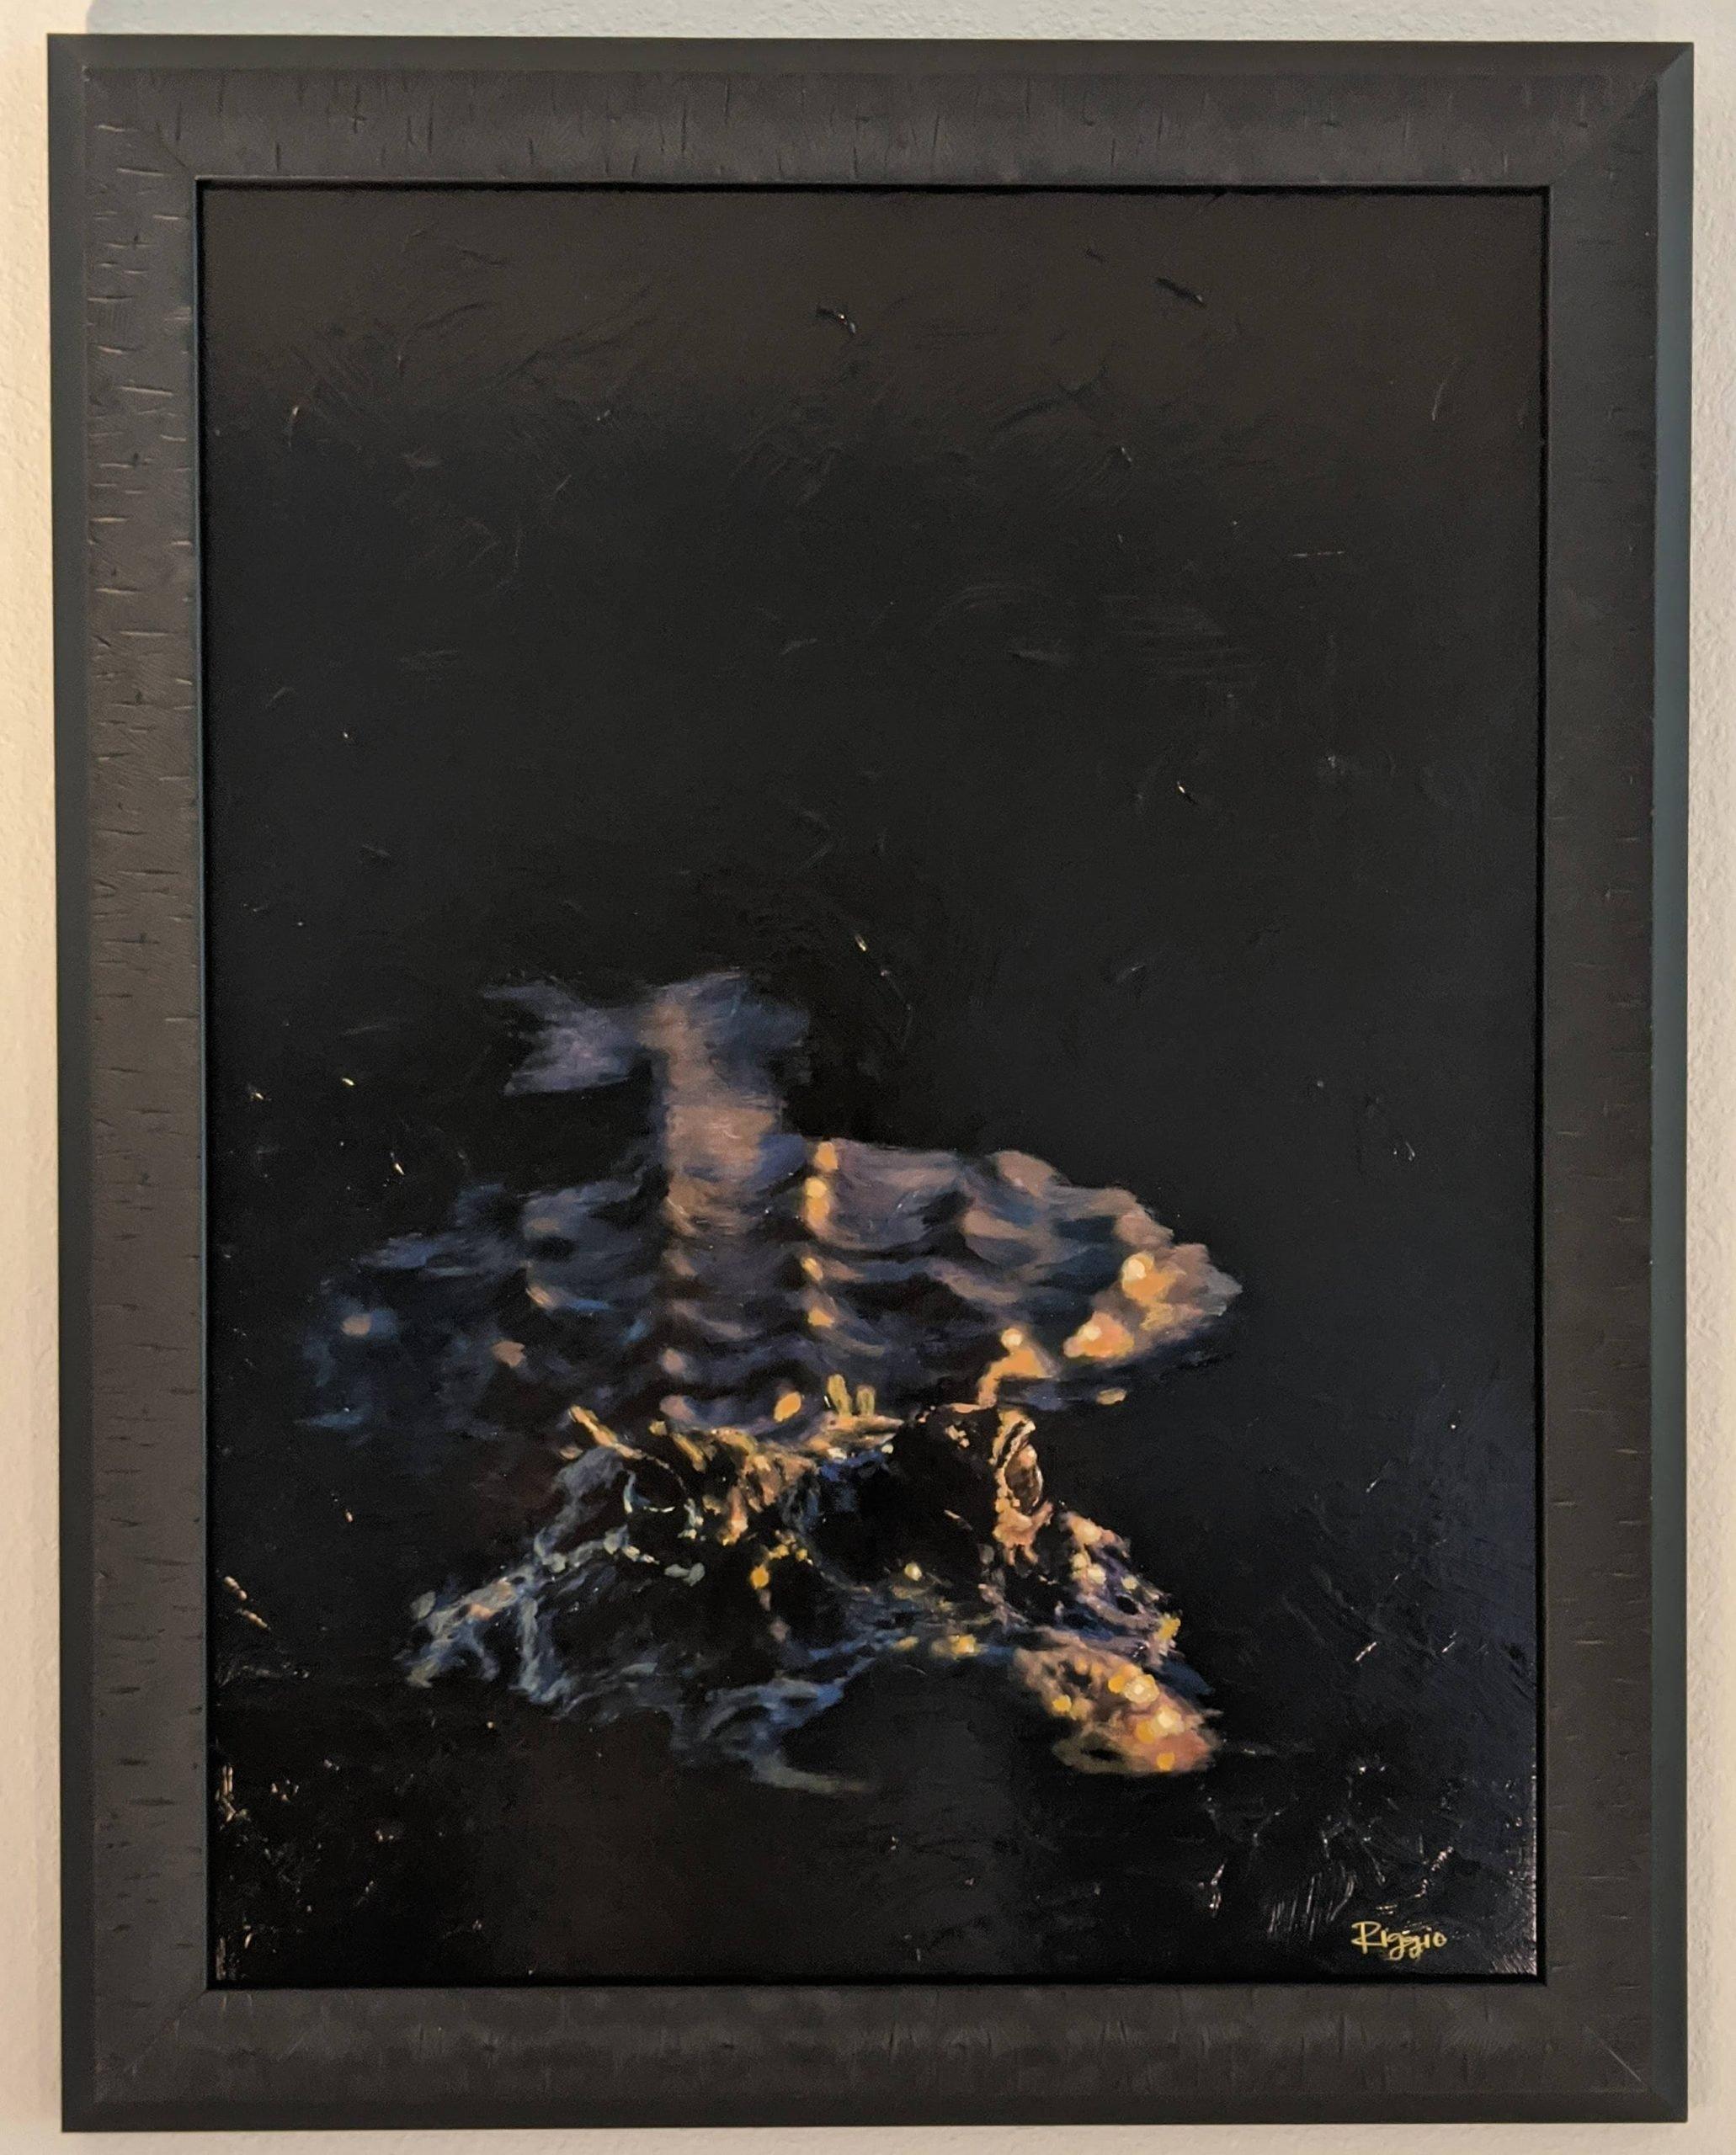 Gator-III-2020-18x24-1.jpg